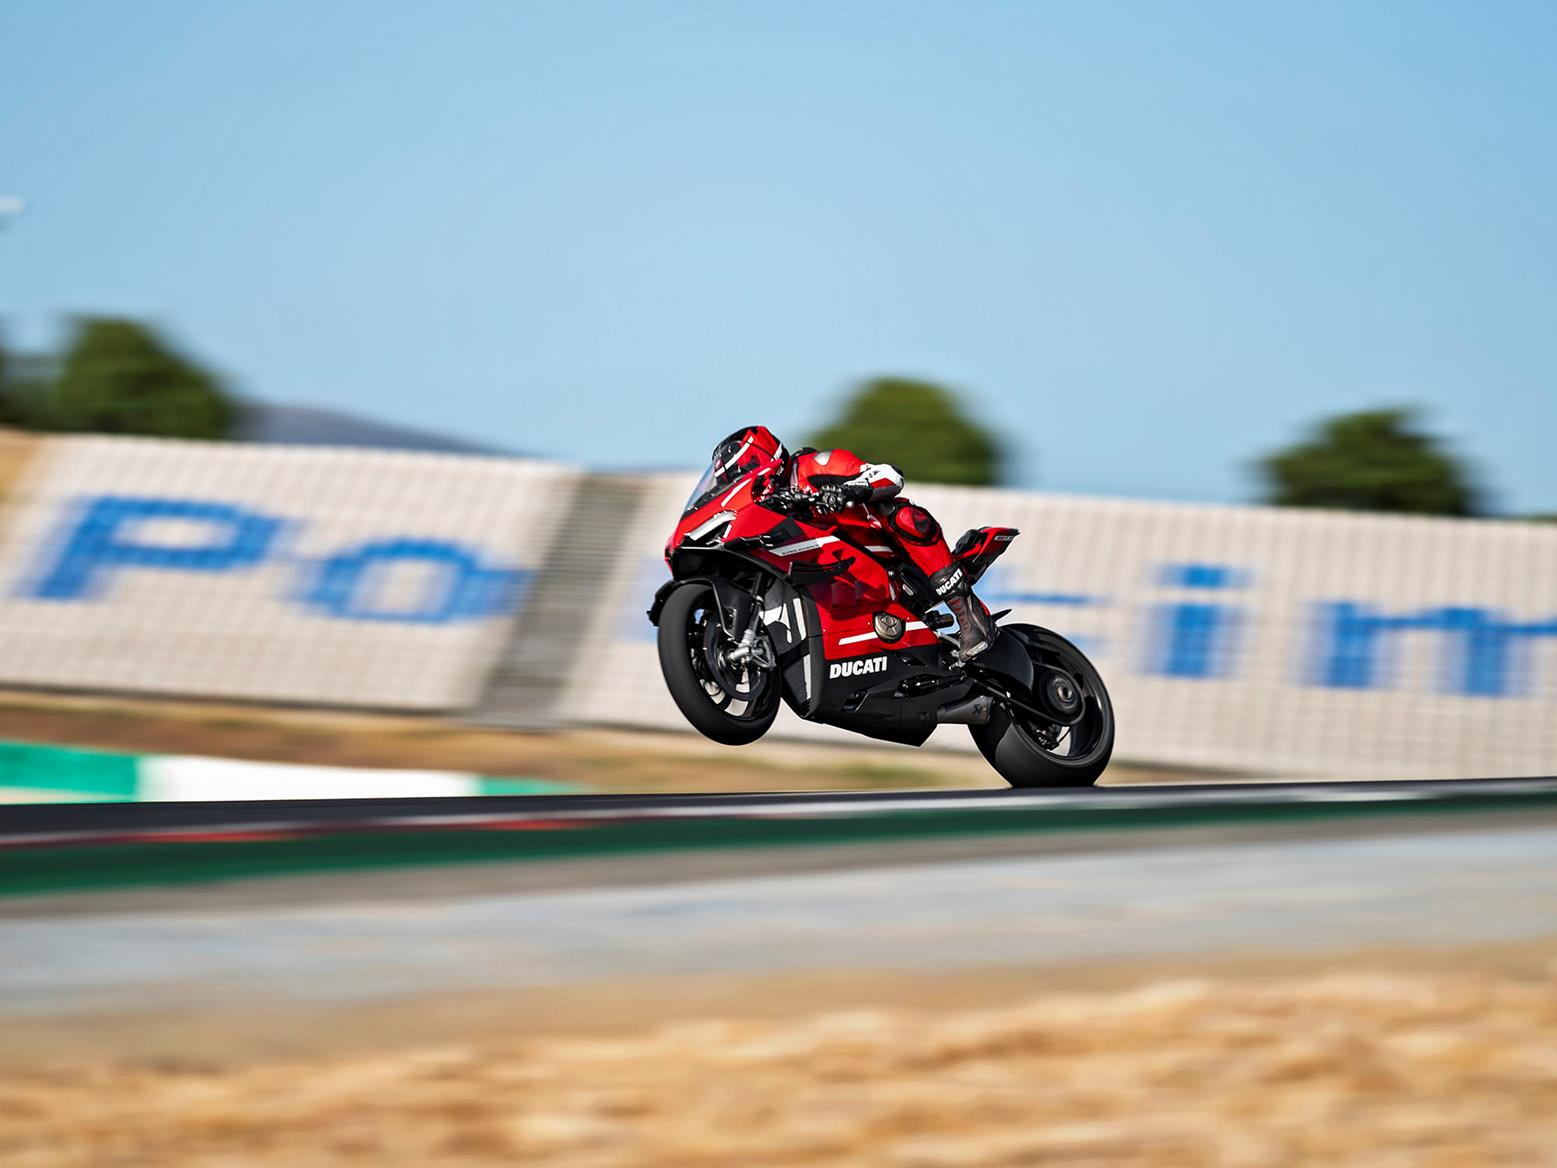 Ducati Superleggera V4 wheelie